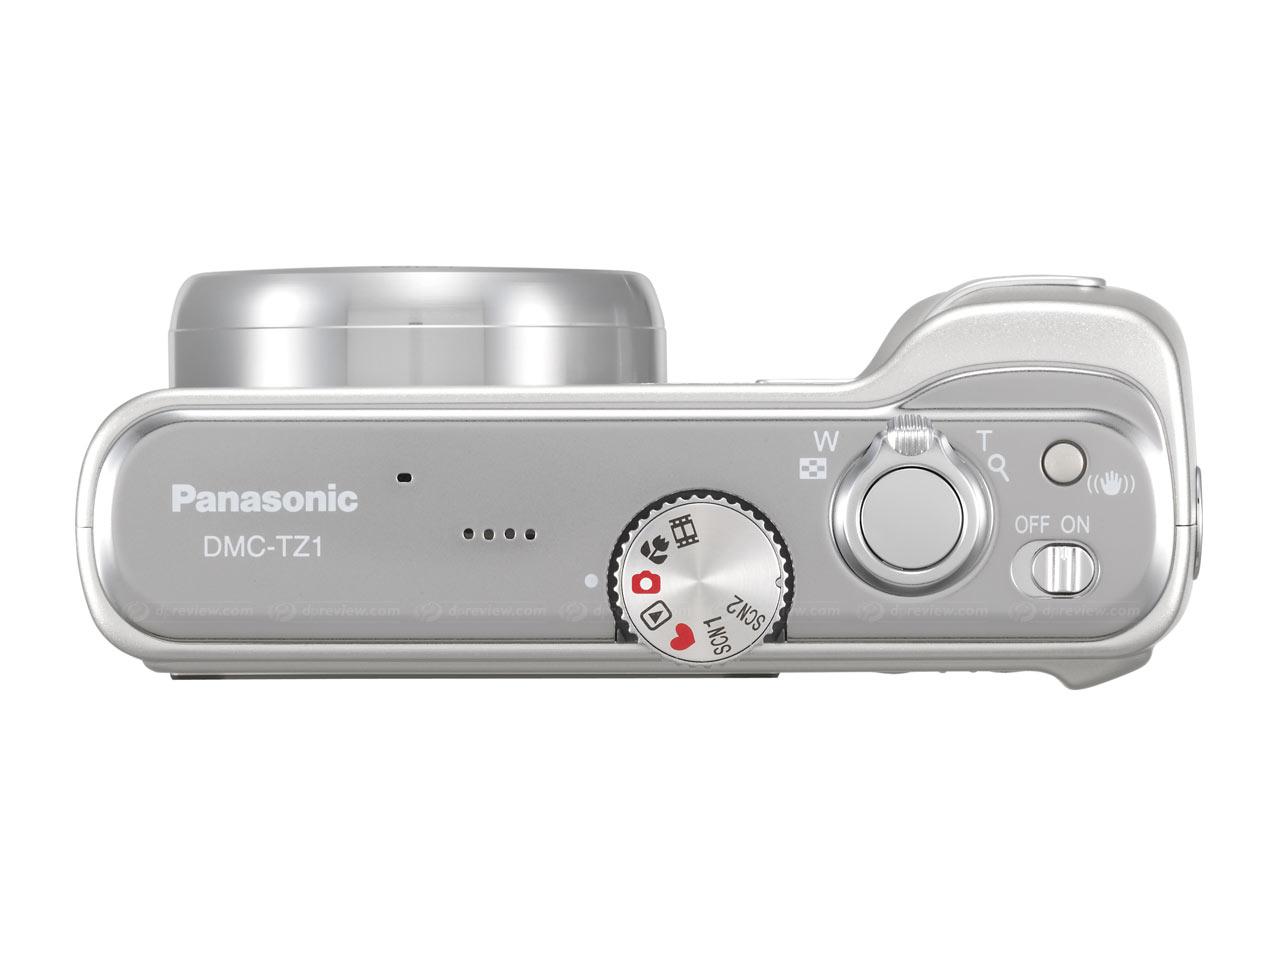 Panasonic DMC-TZ1 Review - Operation